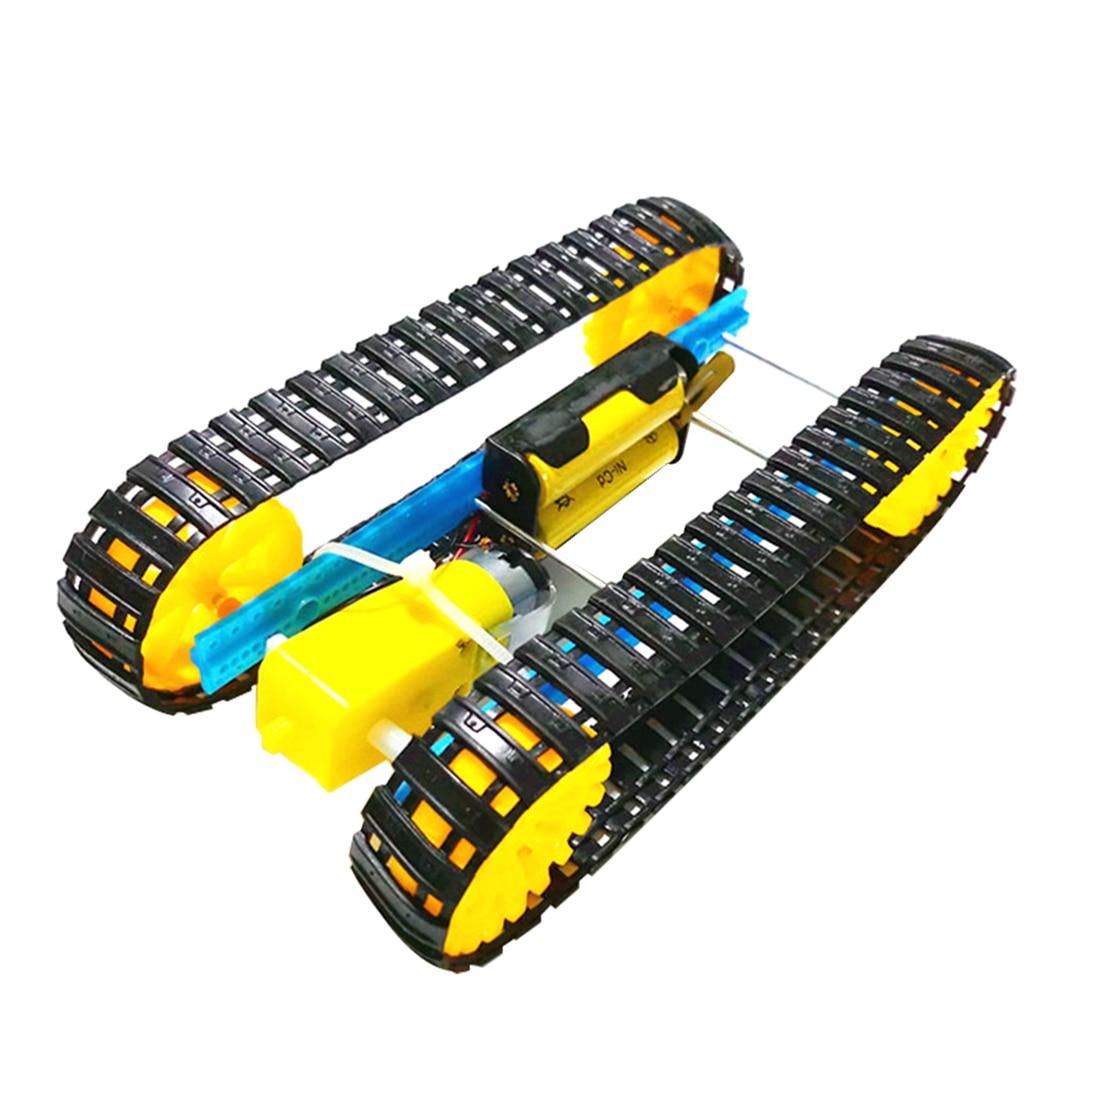 Smart Tank Chassis Handmade Educational Electric Robot Robotic Car Crawler Caterpillar Vehicle DIY Assembled For Children Toy